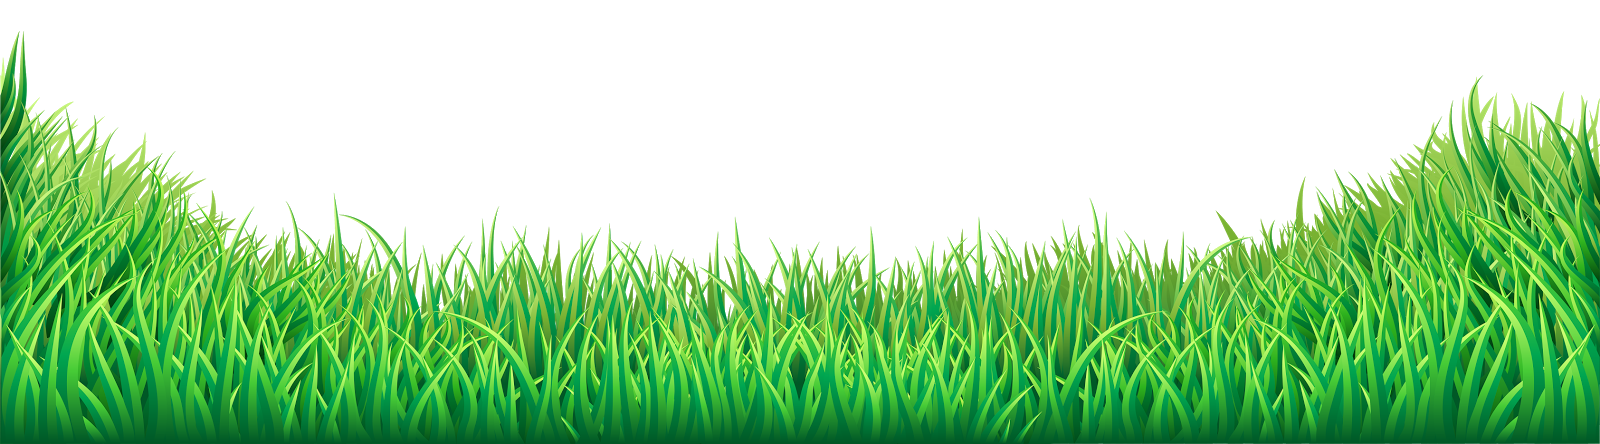 Grass HD PNG - 119867